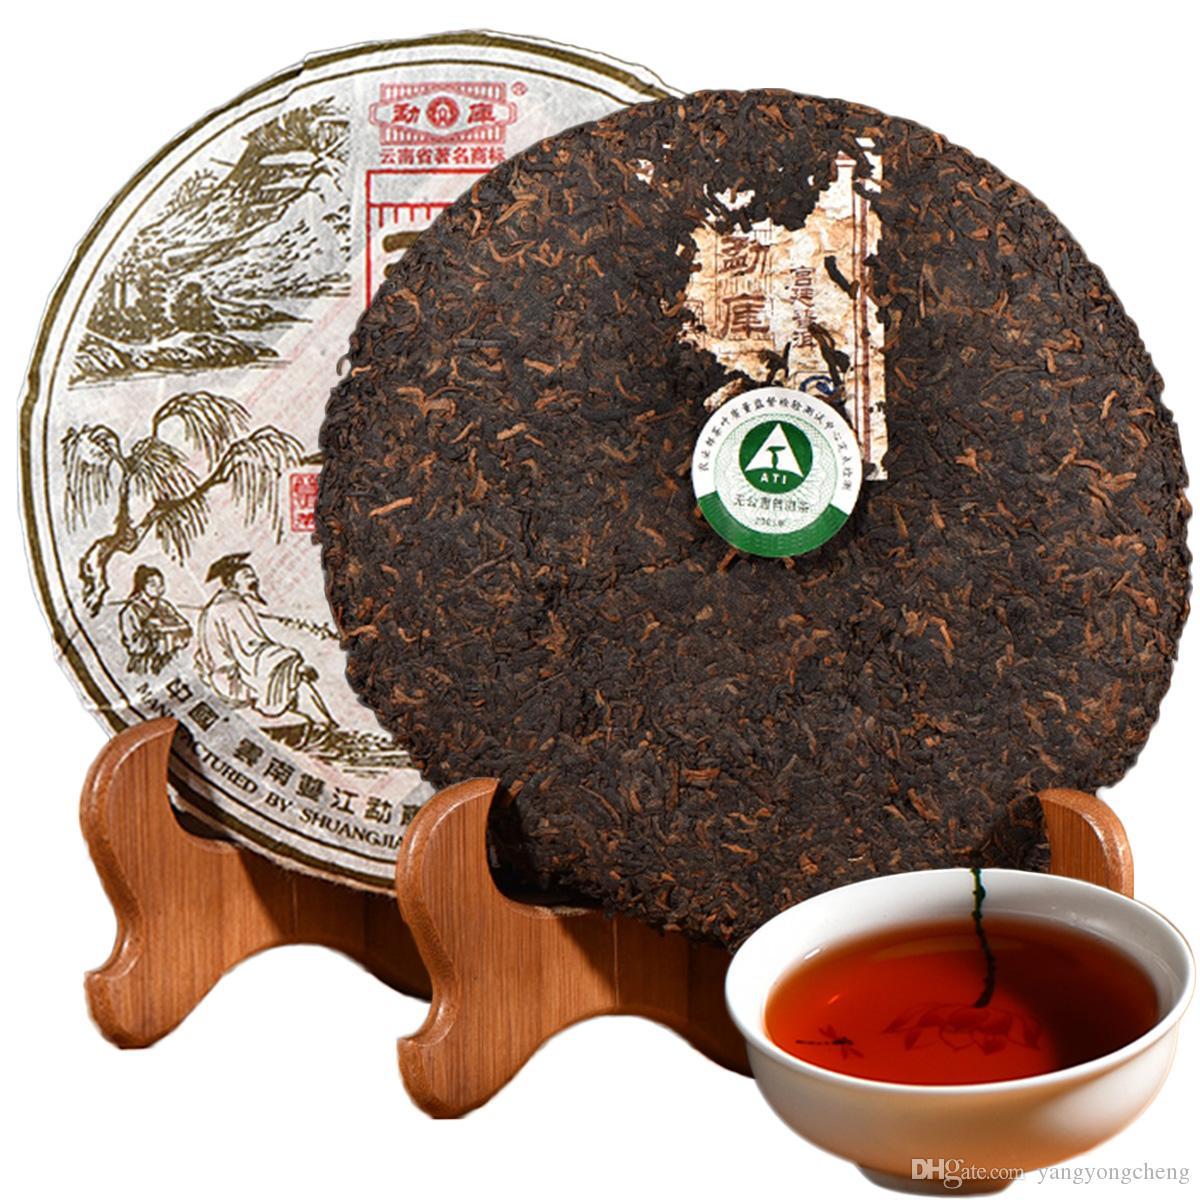 Cinese tè di Pu'er 400g Ripe Puer tè nero Mengku Palazzo Pu er Old Trees Puerh verde cibo cucinato Puerh sanità Puerh